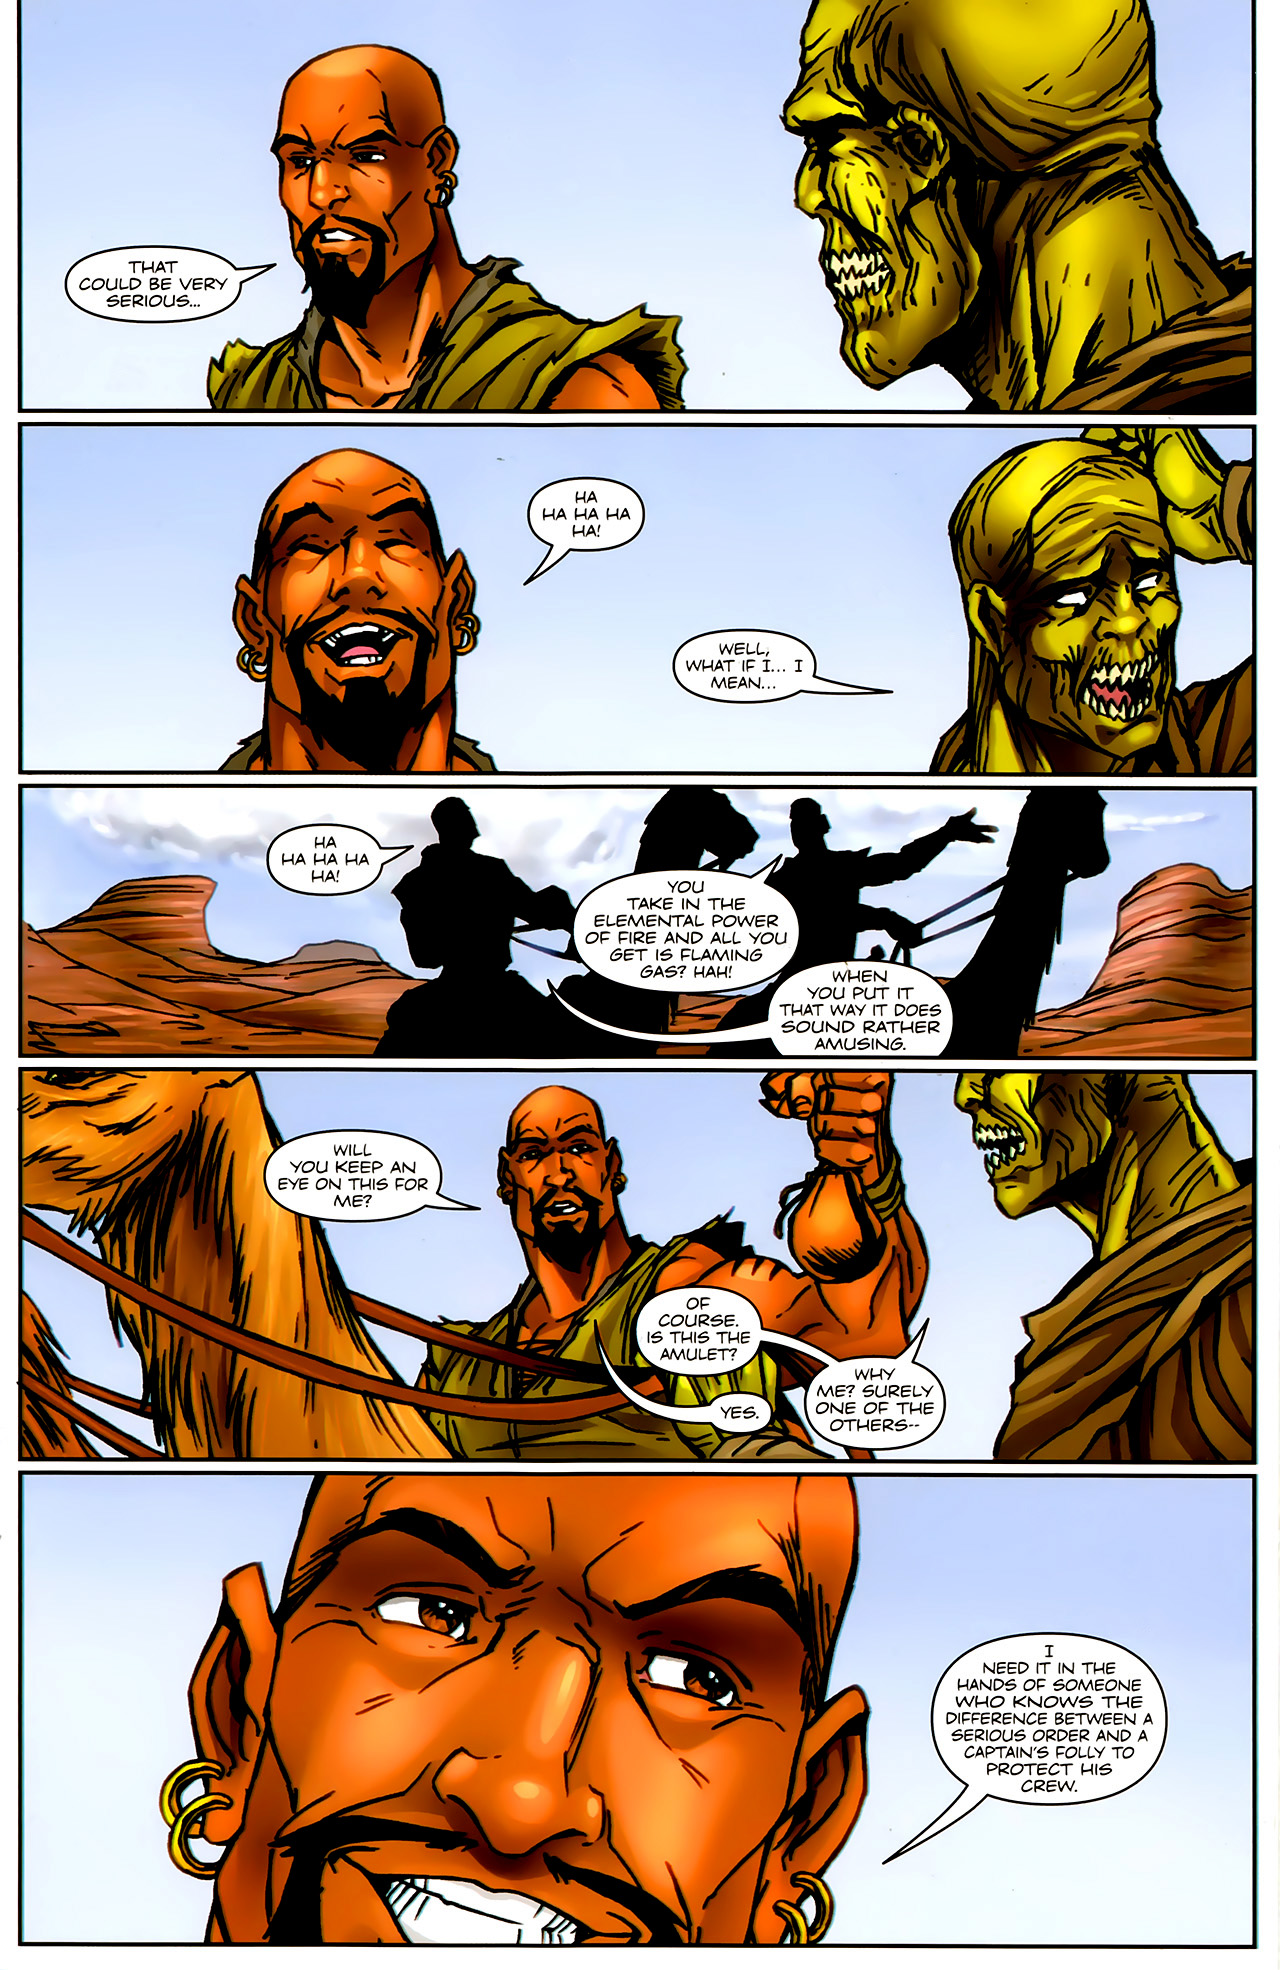 Read online 1001 Arabian Nights: The Adventures of Sinbad comic -  Issue #9 - 13